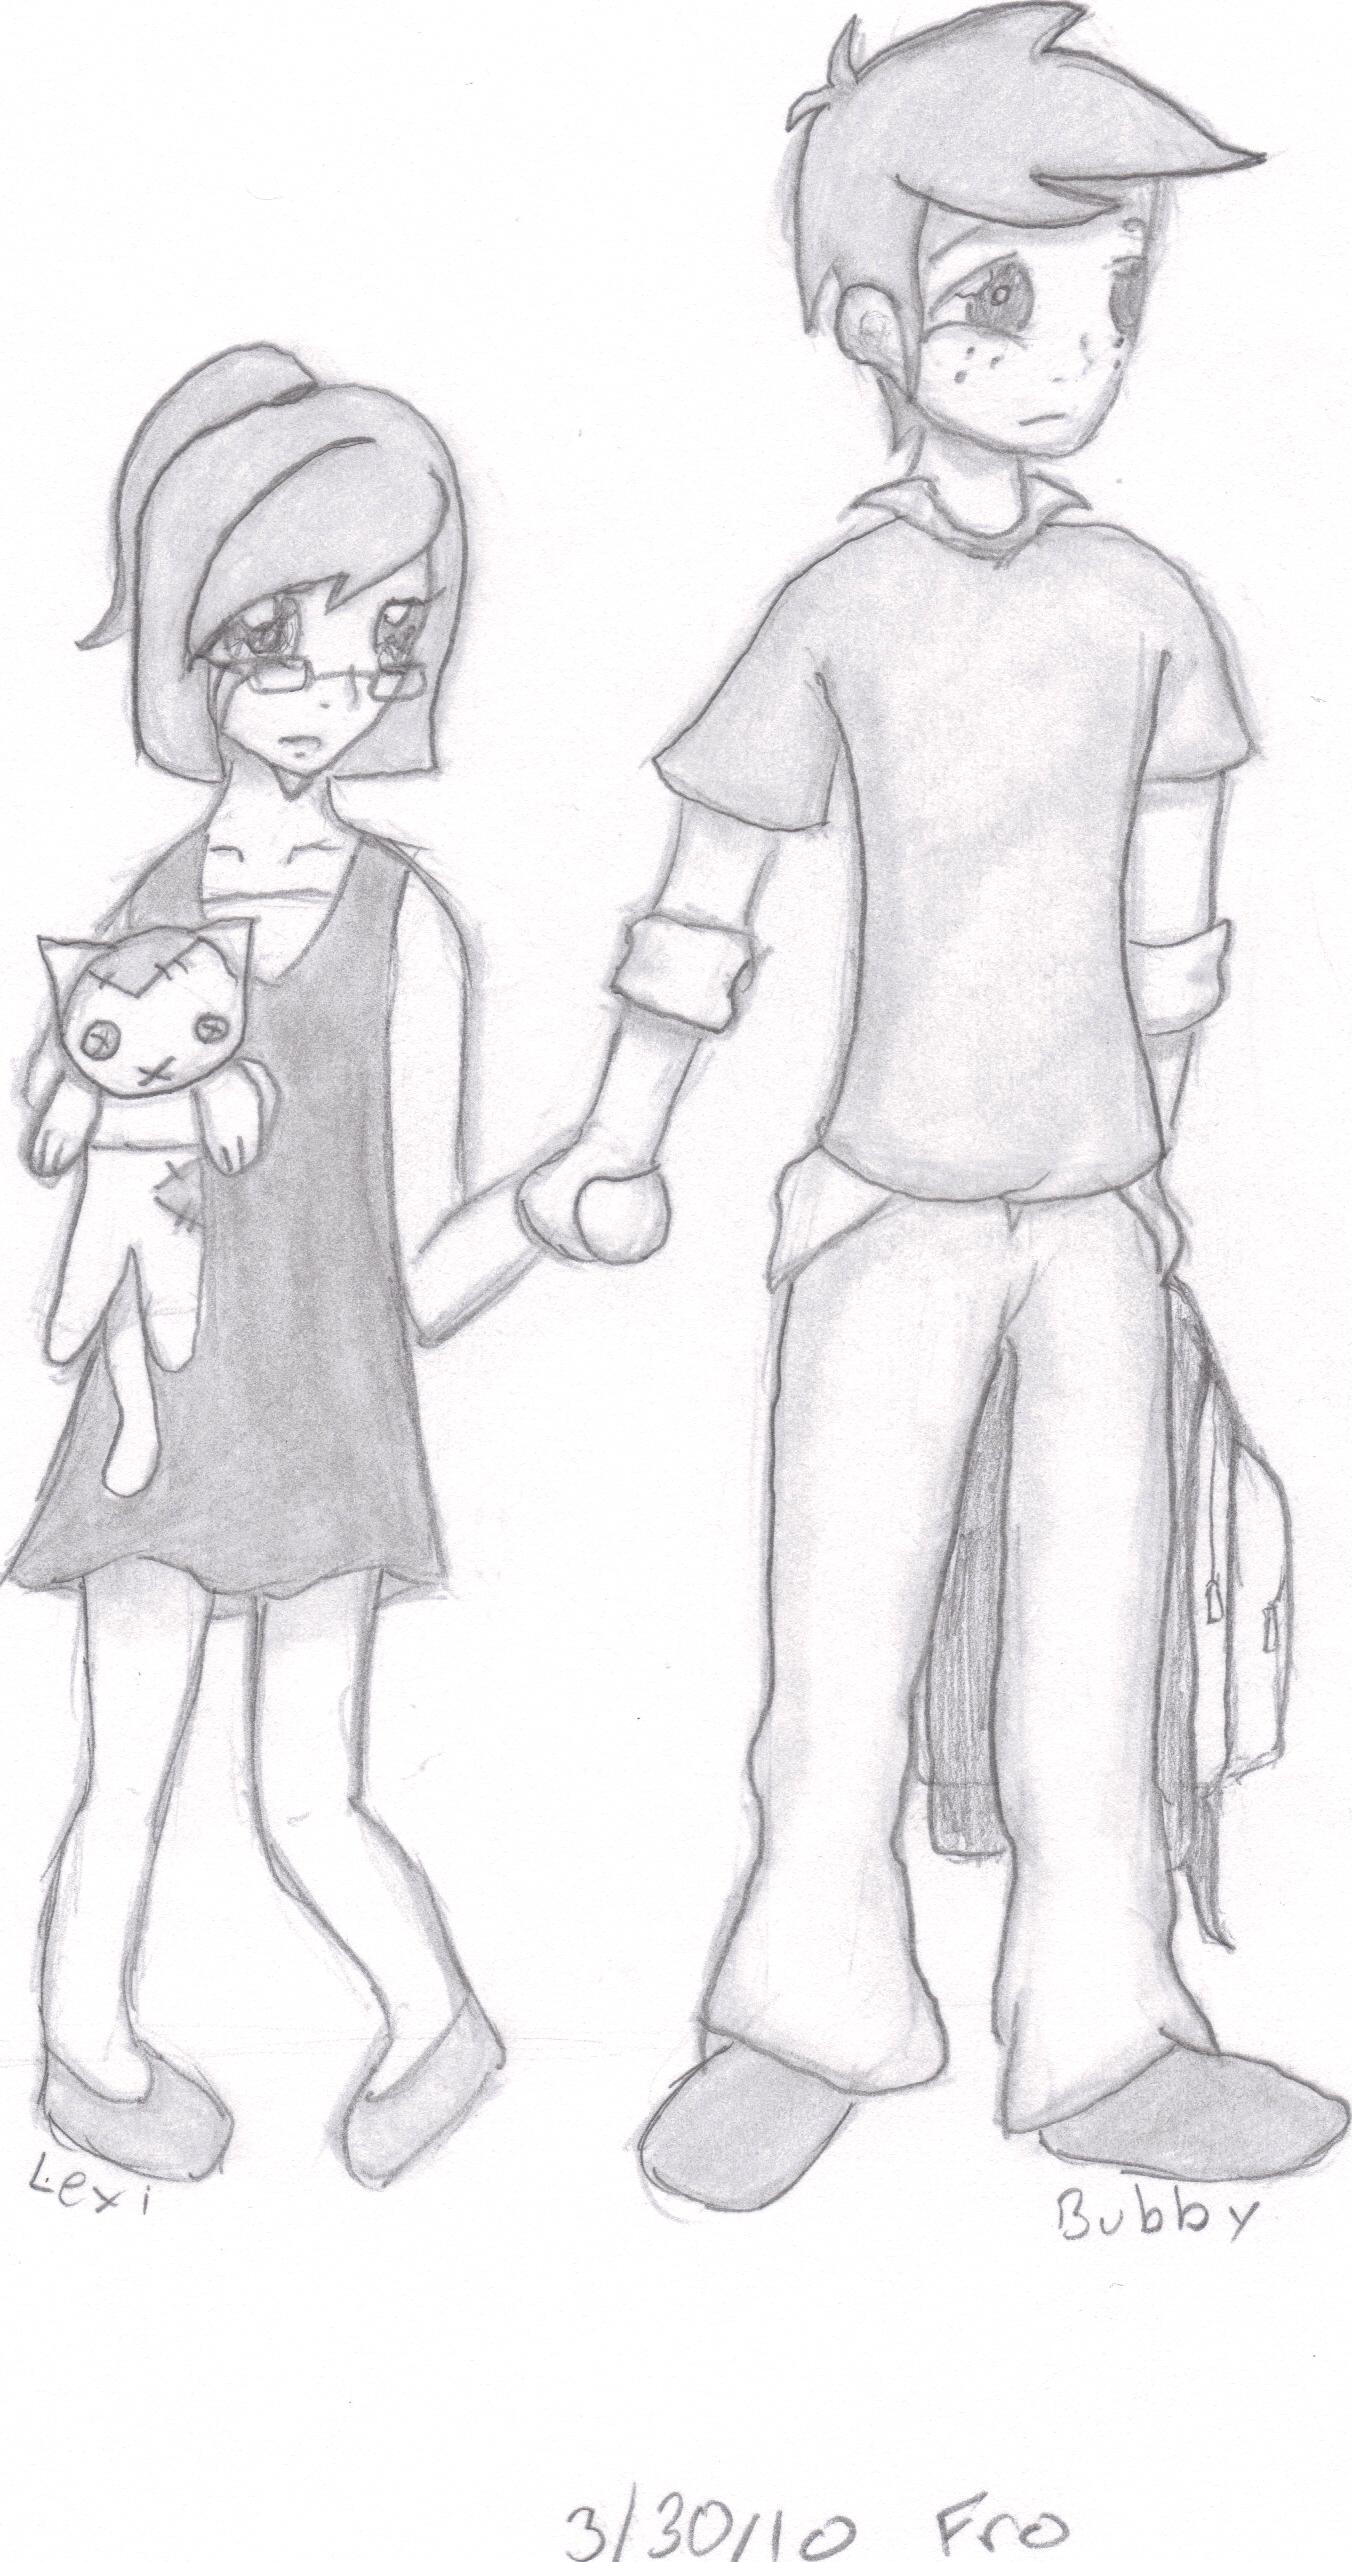 Drawn sad Realized mood the why them